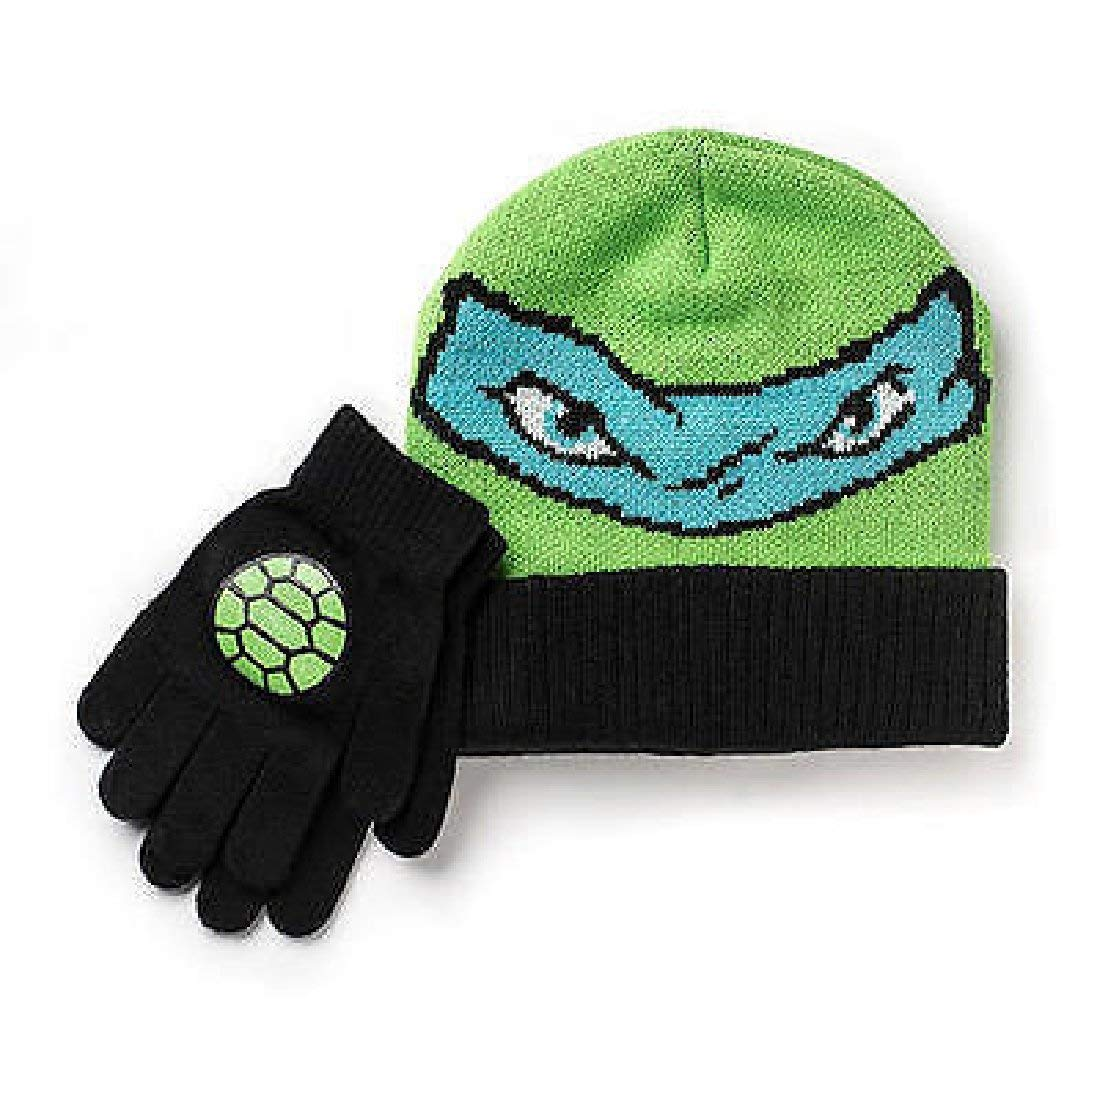 cc8fb0bb423 Get Quotations · Teenage Mutant Ninja Turtles Hat and Gloves Set Boys